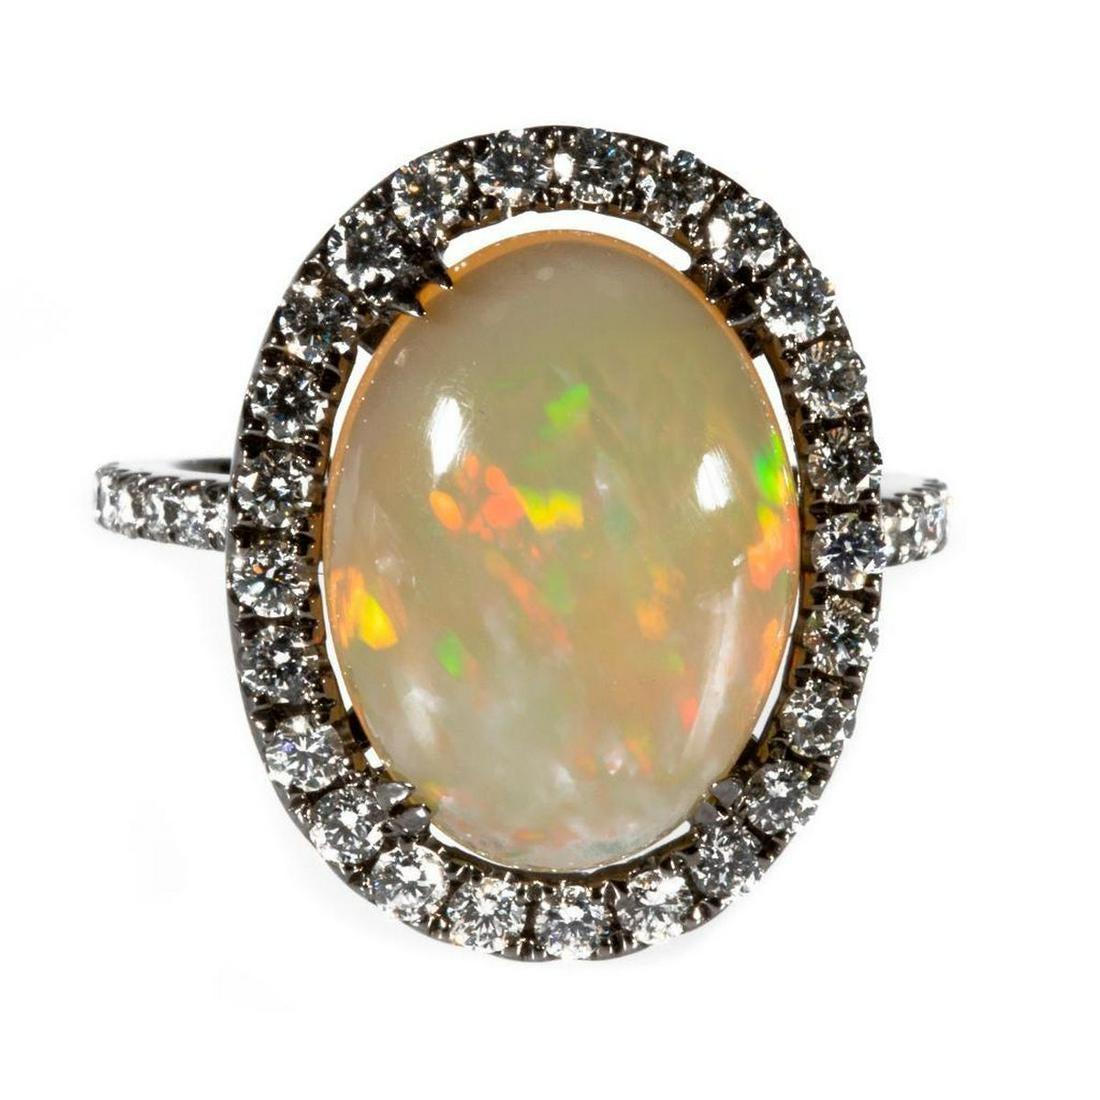 Opal, diamond and 18k blackened gold ring